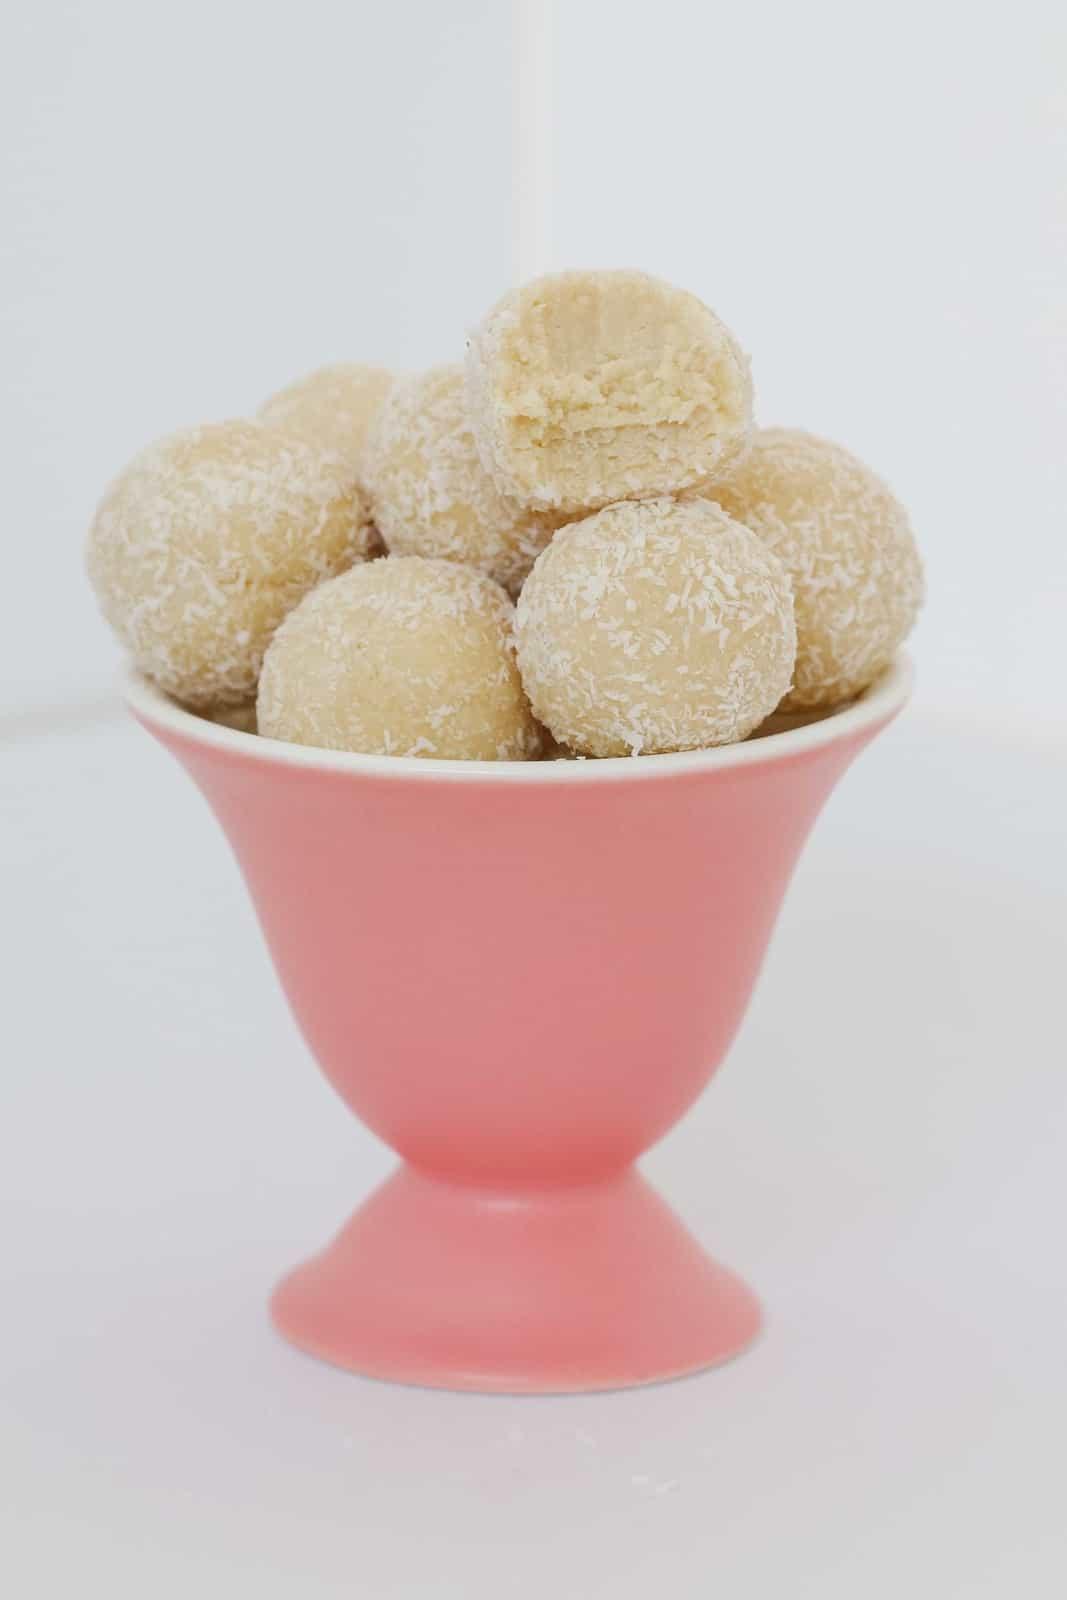 A half eaten dessert ball made with Tim Tam biscuits.